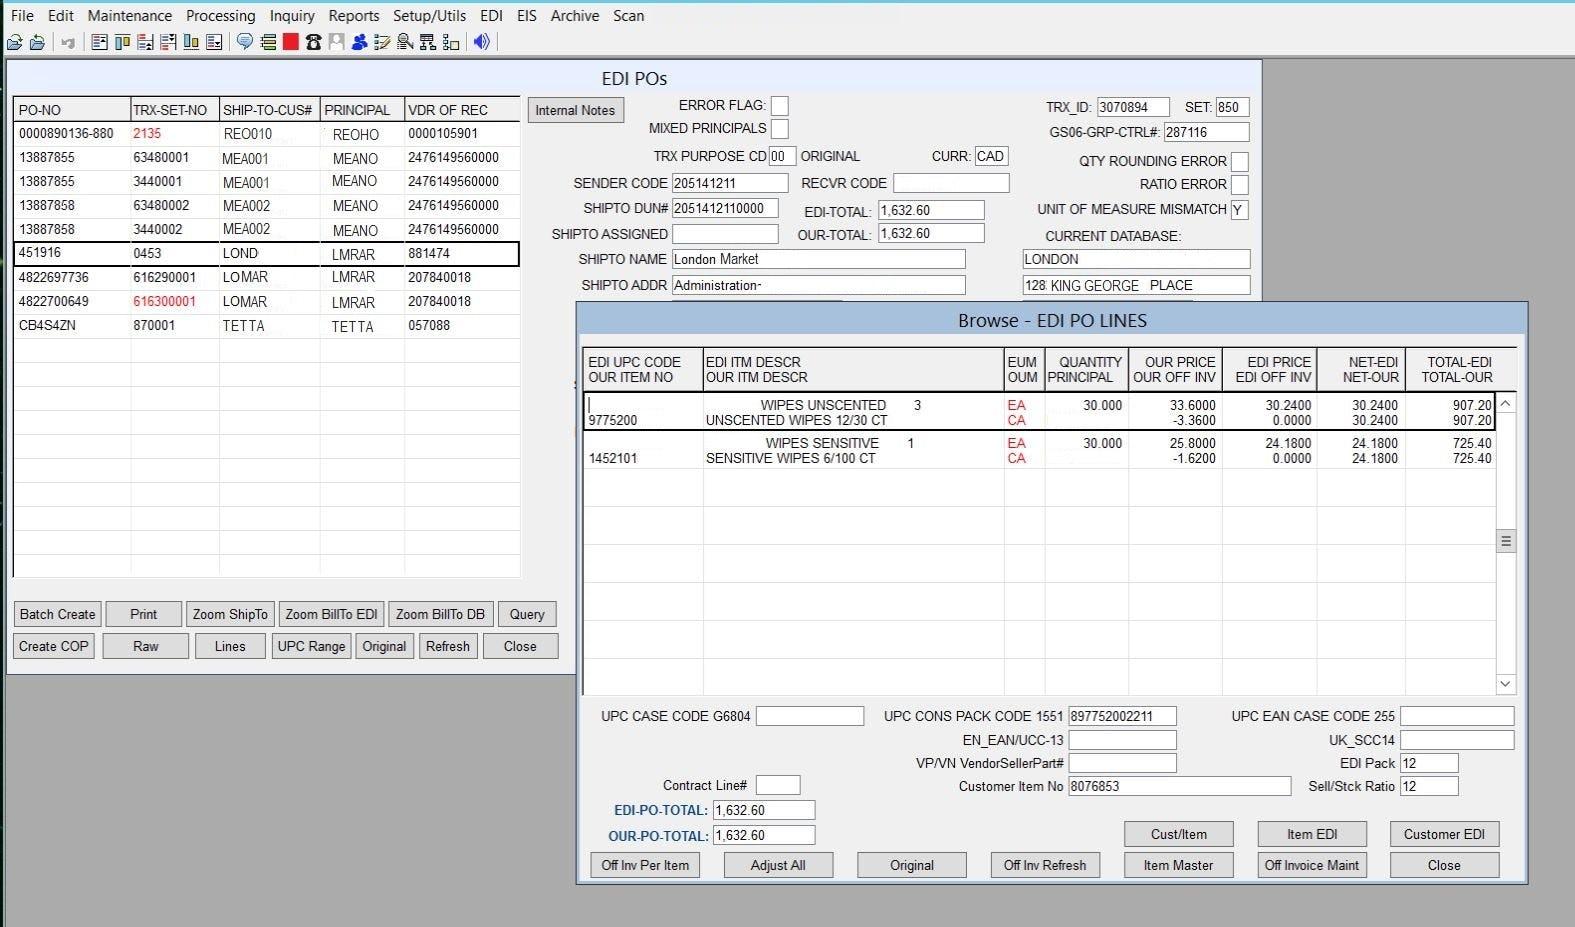 Synchronous ERP Software - EDI